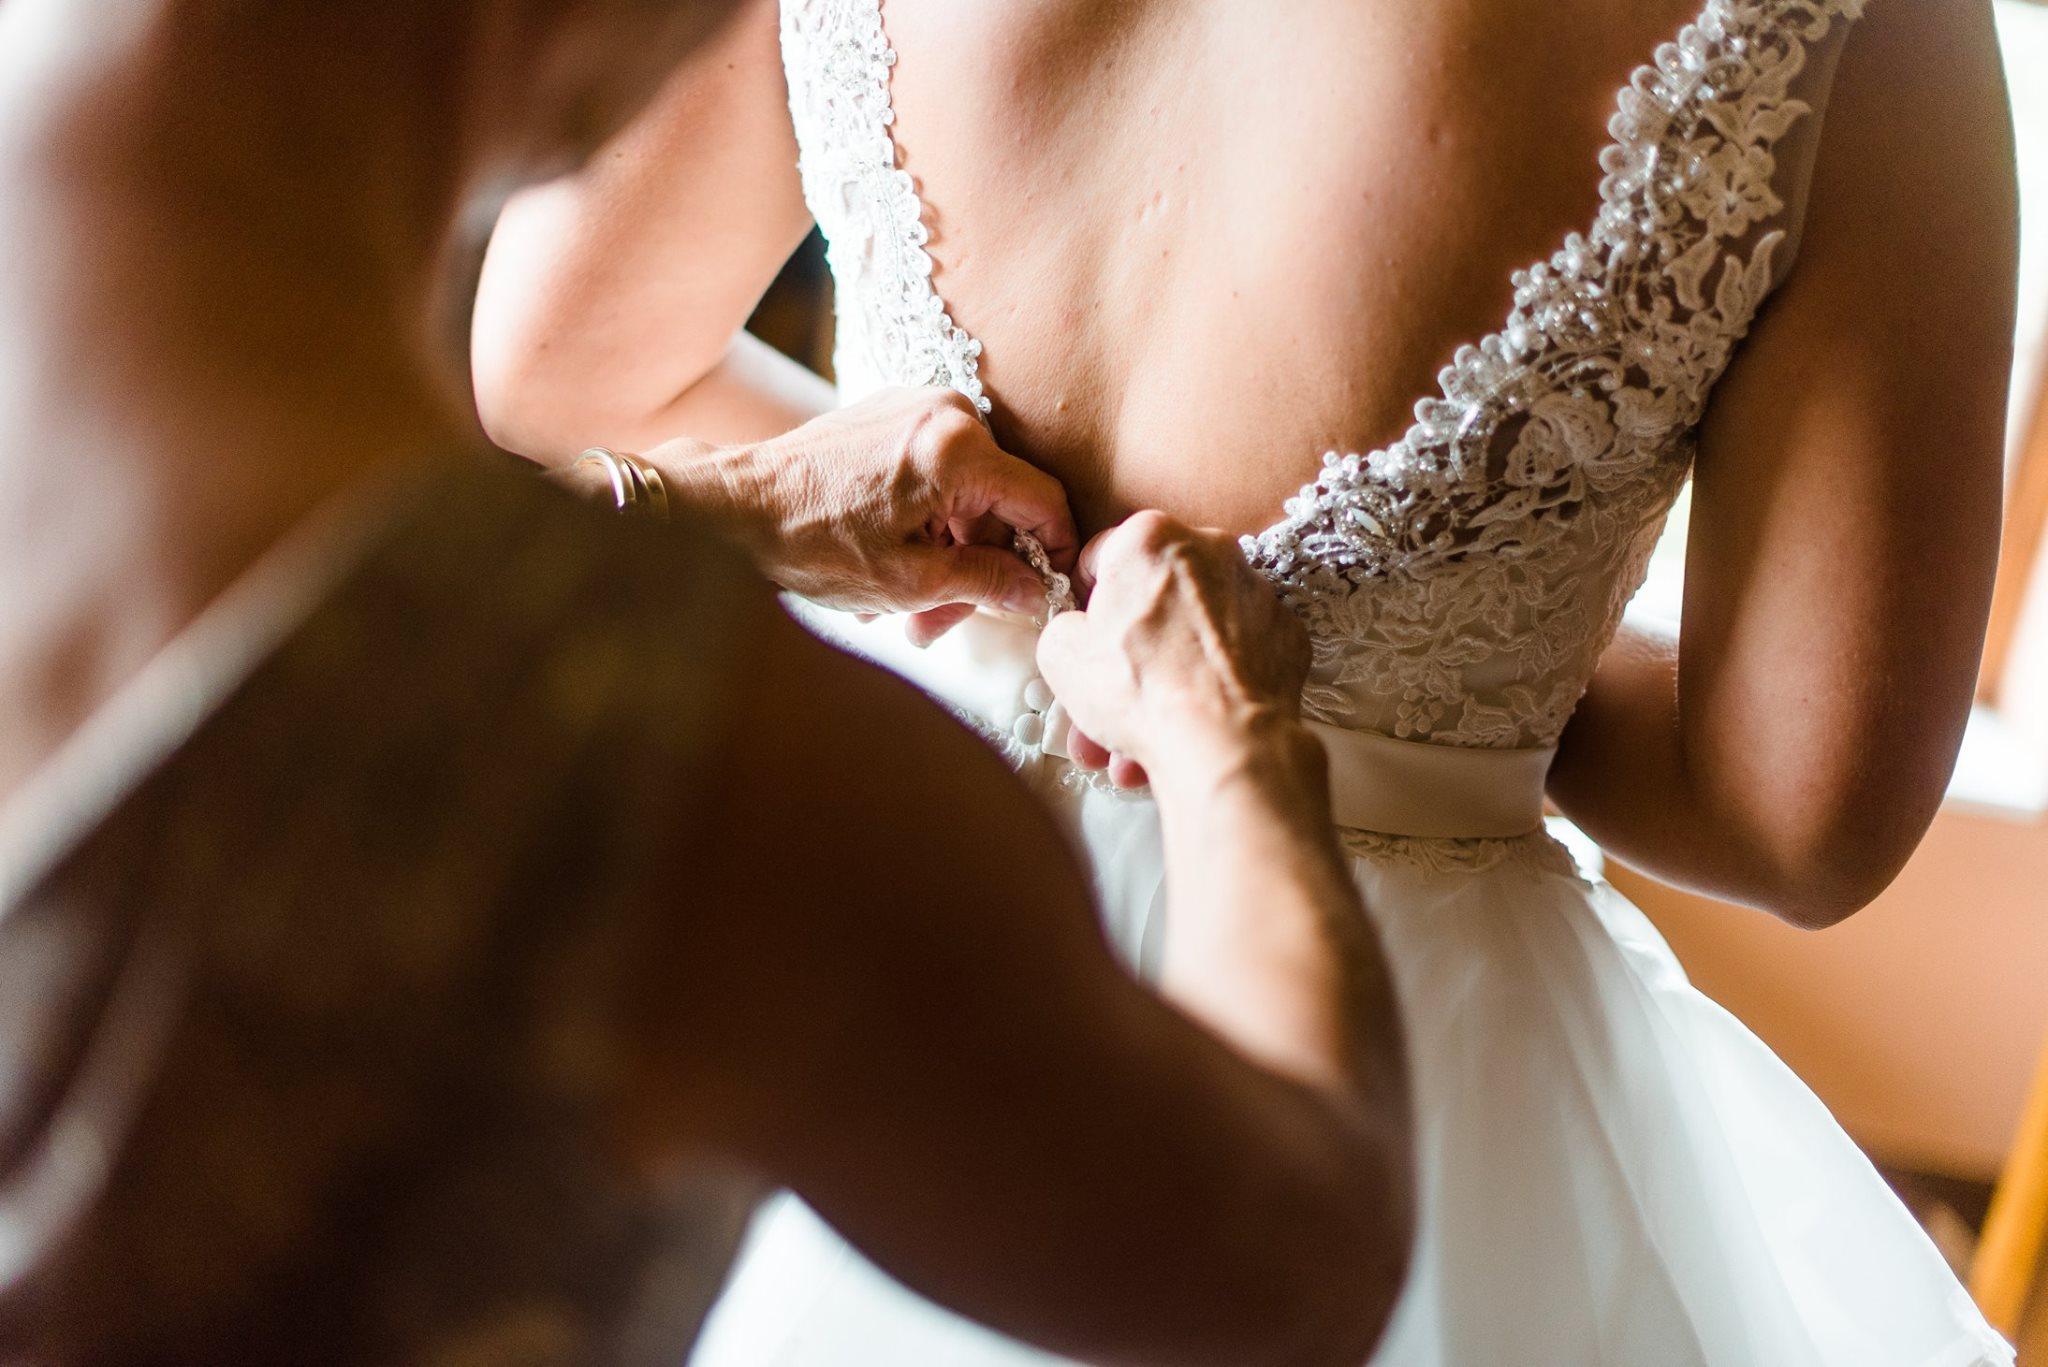 pennsylvania-backyard-wedding-love-diy-bohemian-romantic-colorful-0008.jpg